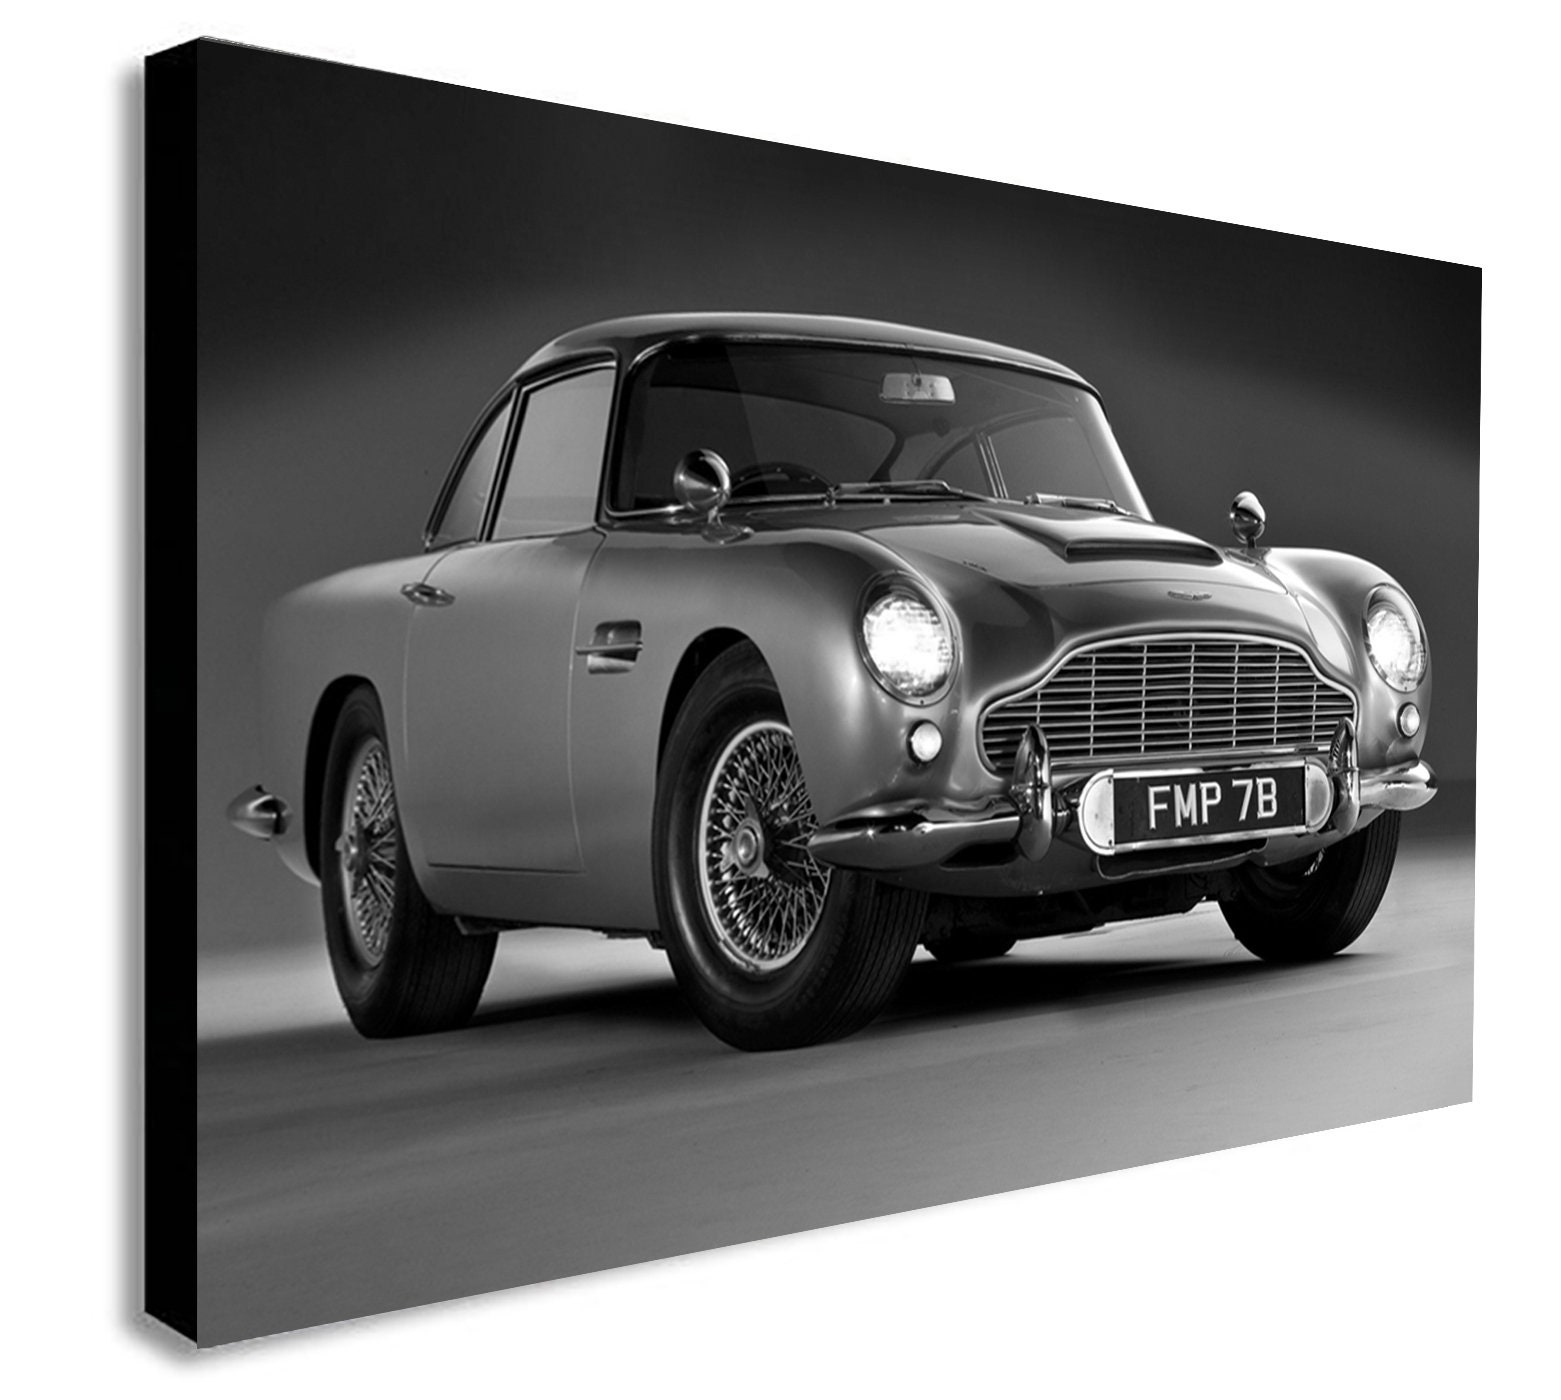 aston martin db5 james bond canvas wall art print | etsy